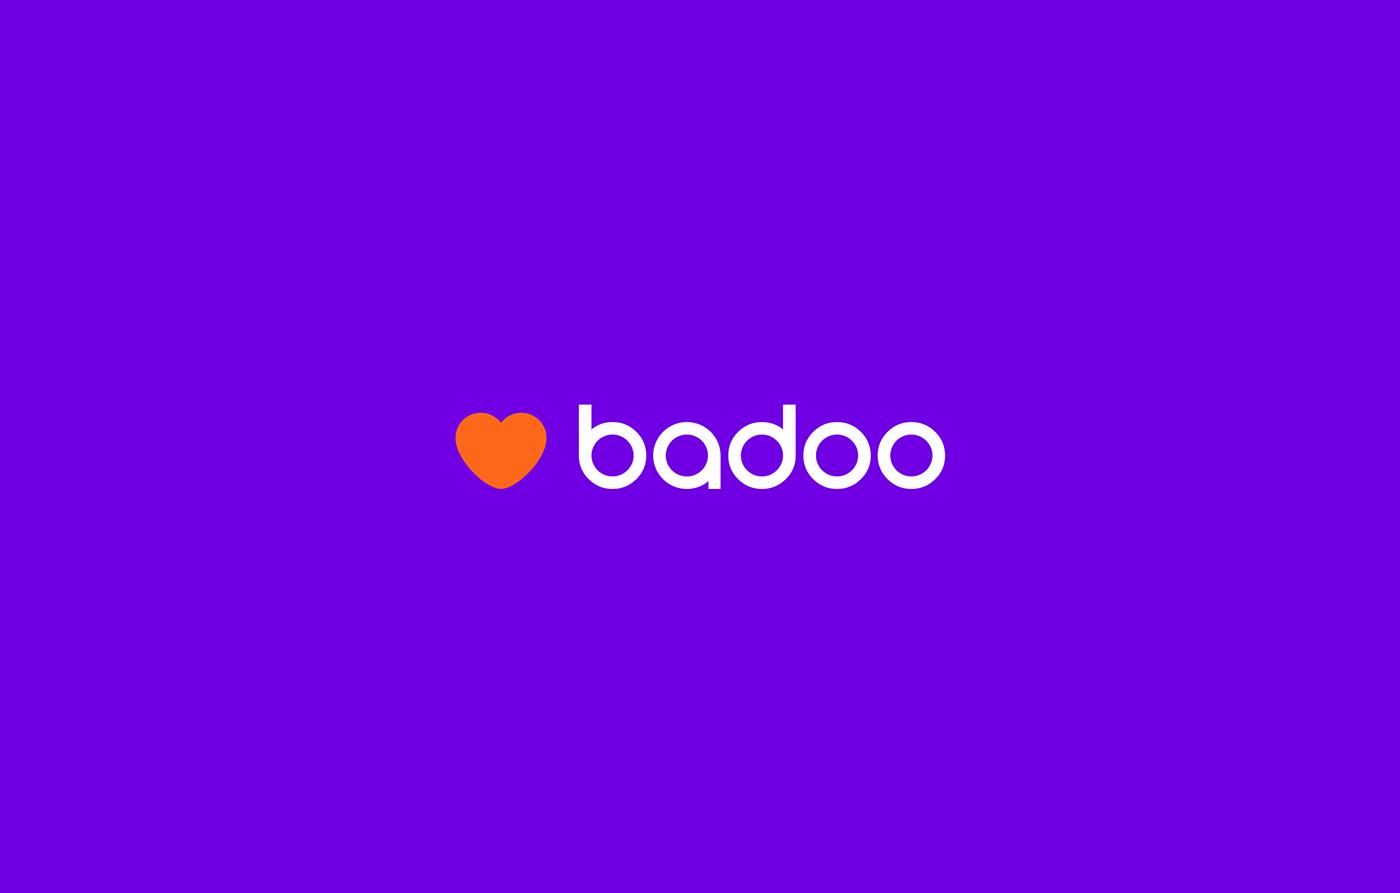 Usa Badoo gratis SIN pago [Trucco] 1